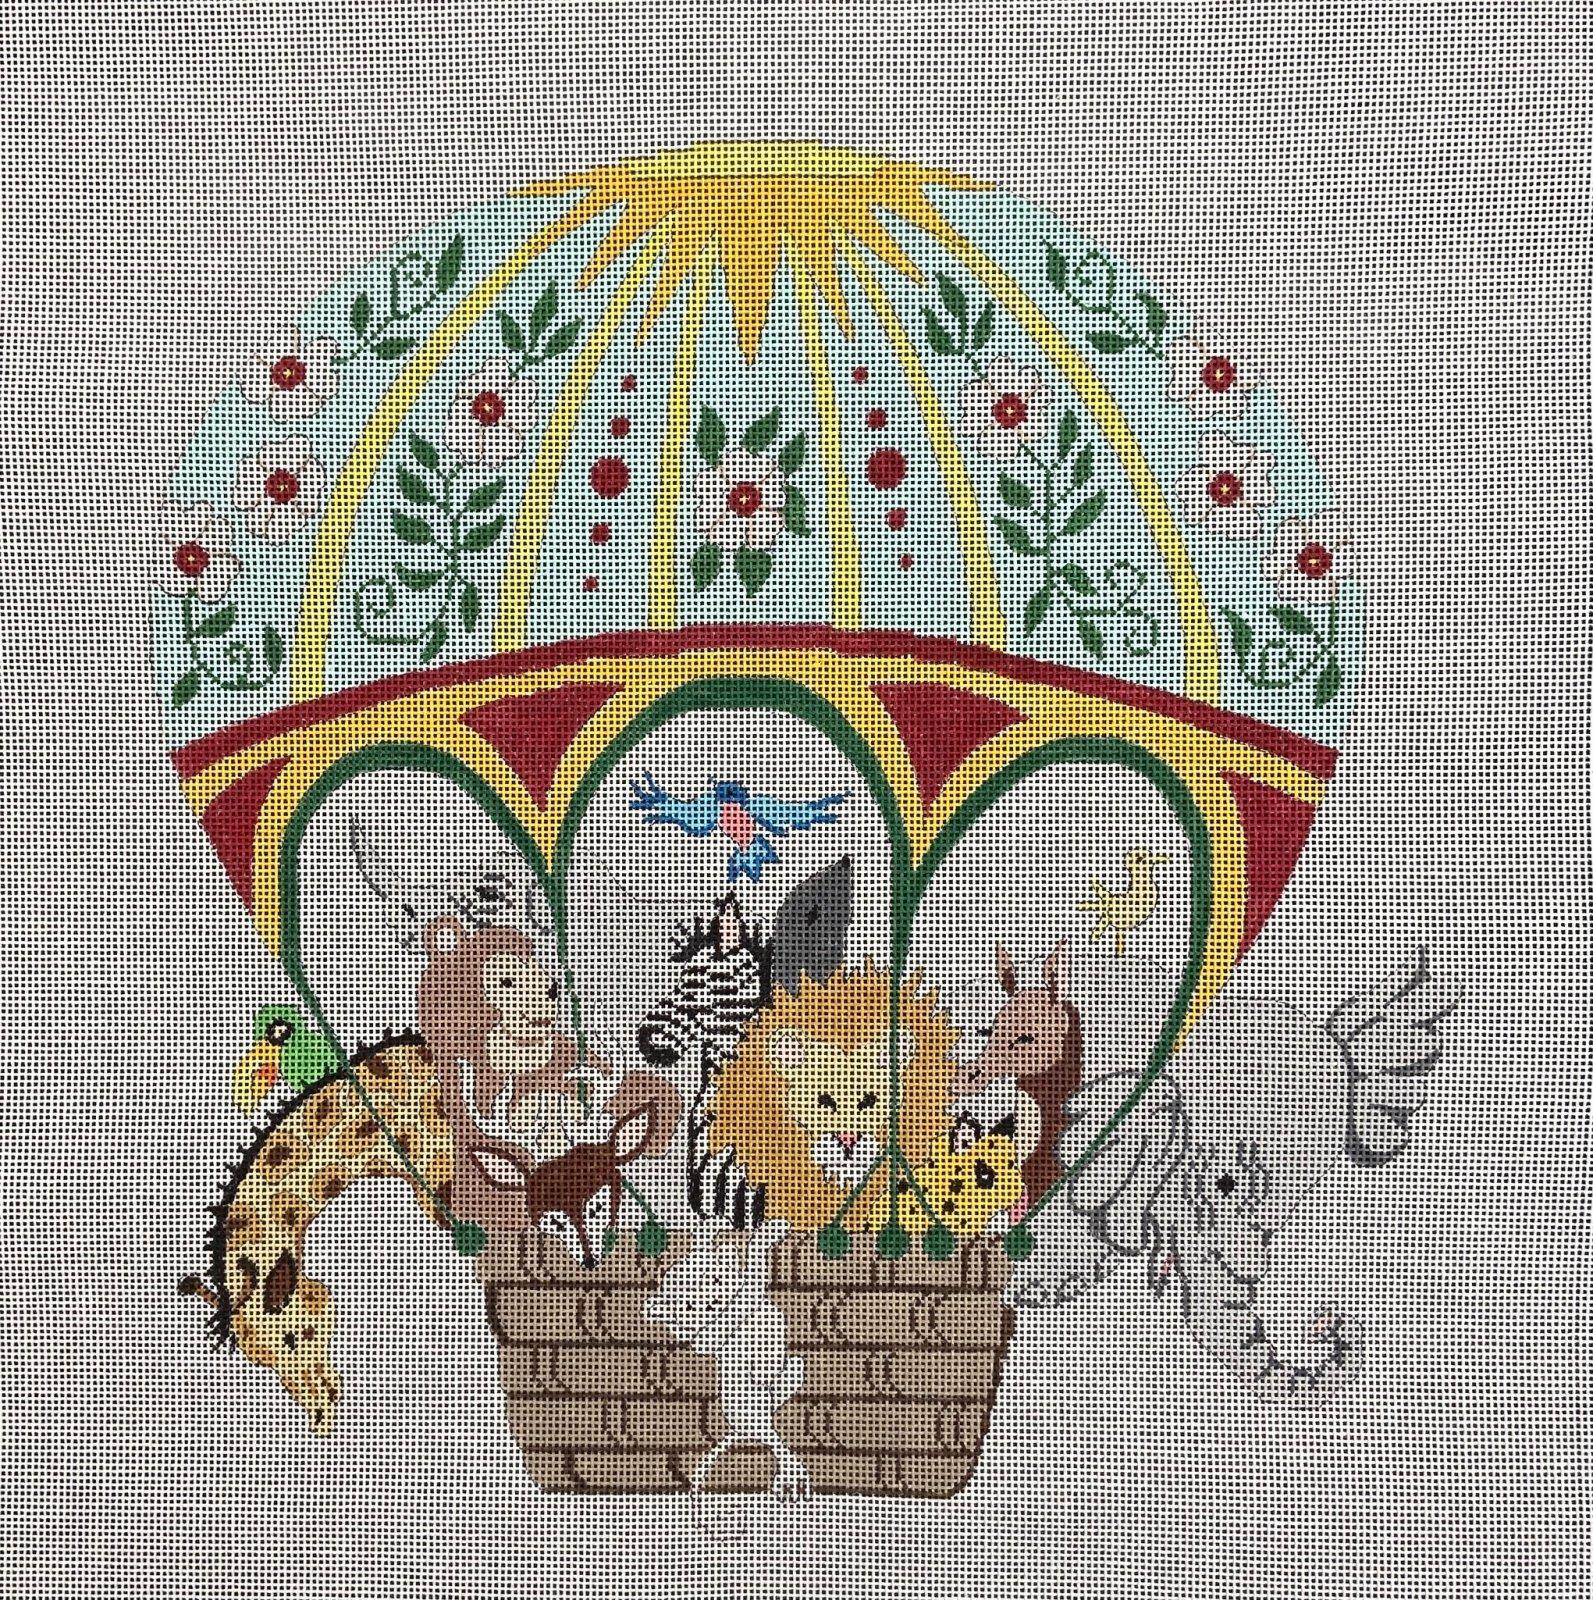 CBKP165 Baby Animals in a Ballon CBK Needlepoint Collections